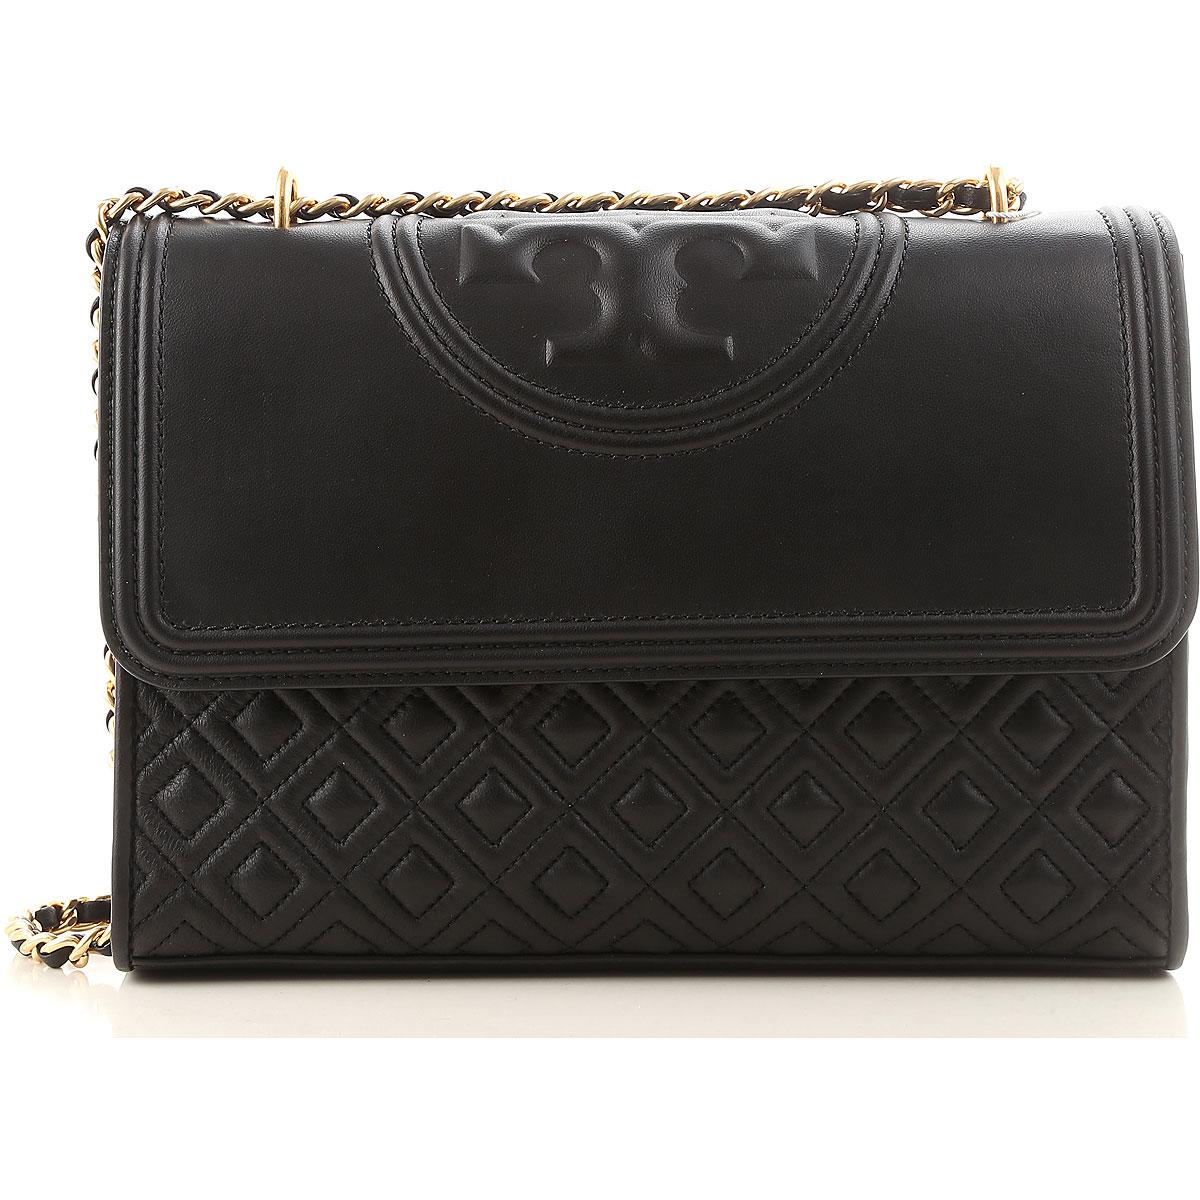 Tory Burch Shoulder Bag for Women, Black, Leather, 2017 USA-444394